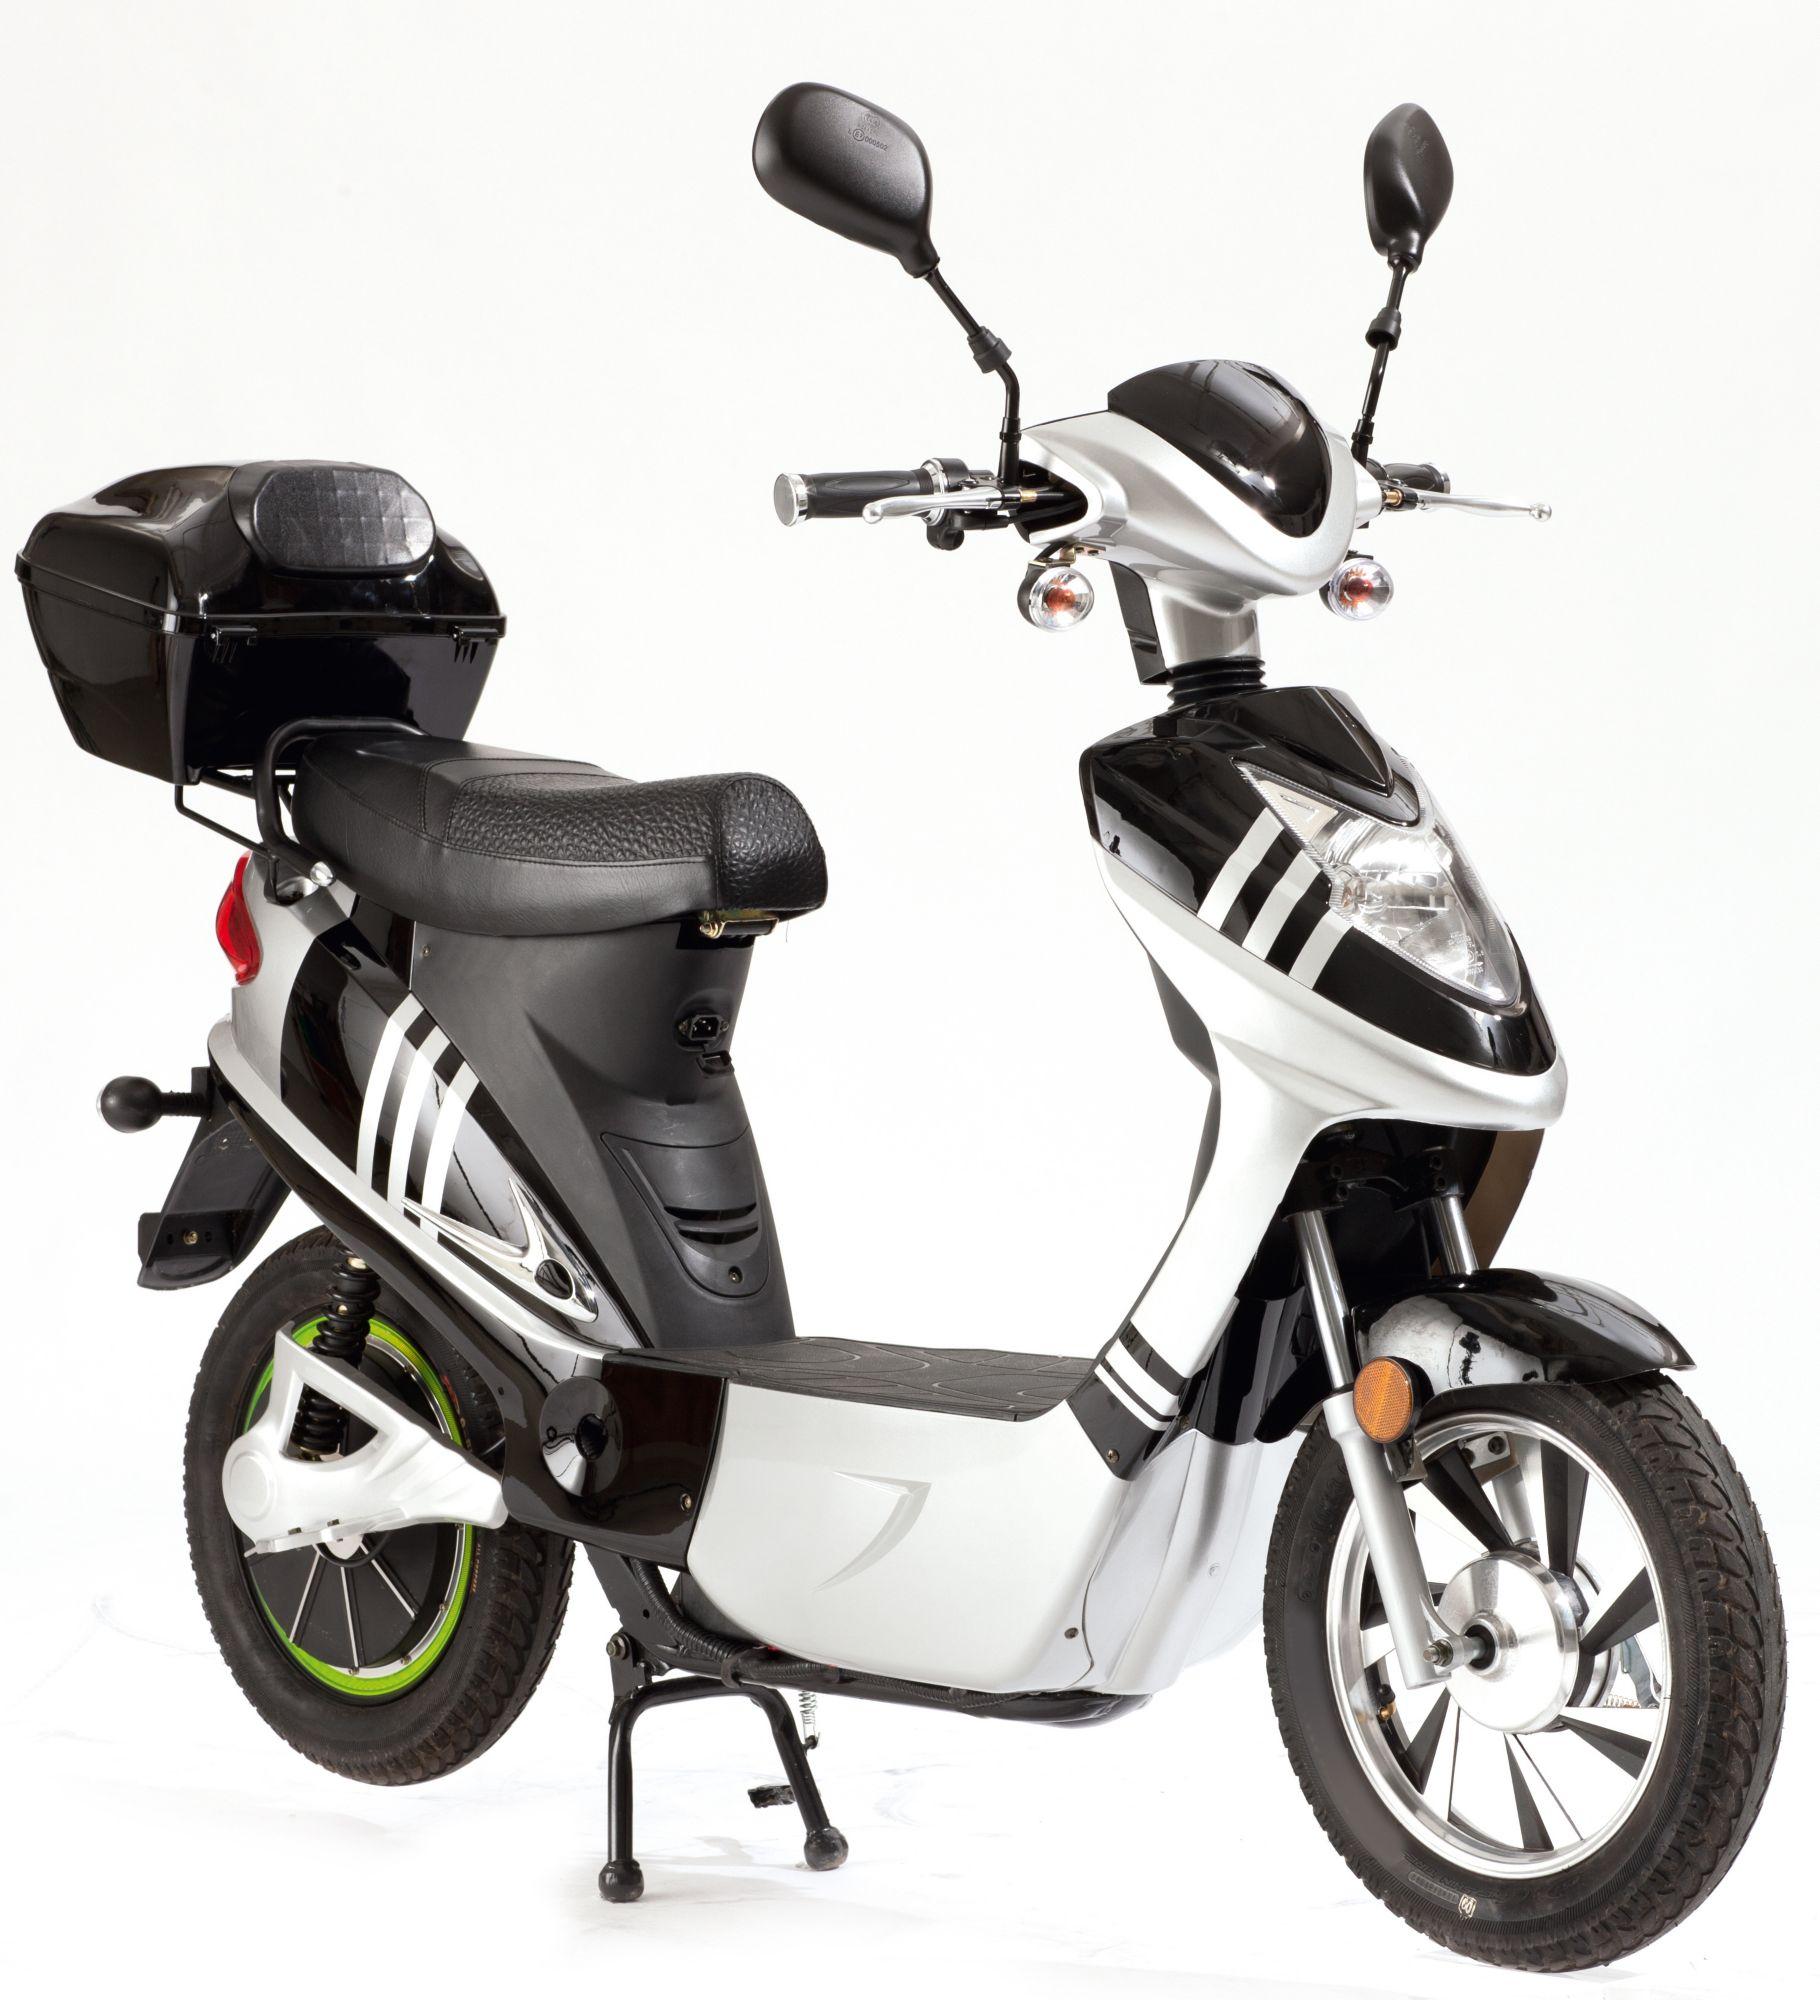 DIDI THURAU EDITION Didi Thurau Edition Elektro-Roller, 40 km/h, »City-Star«